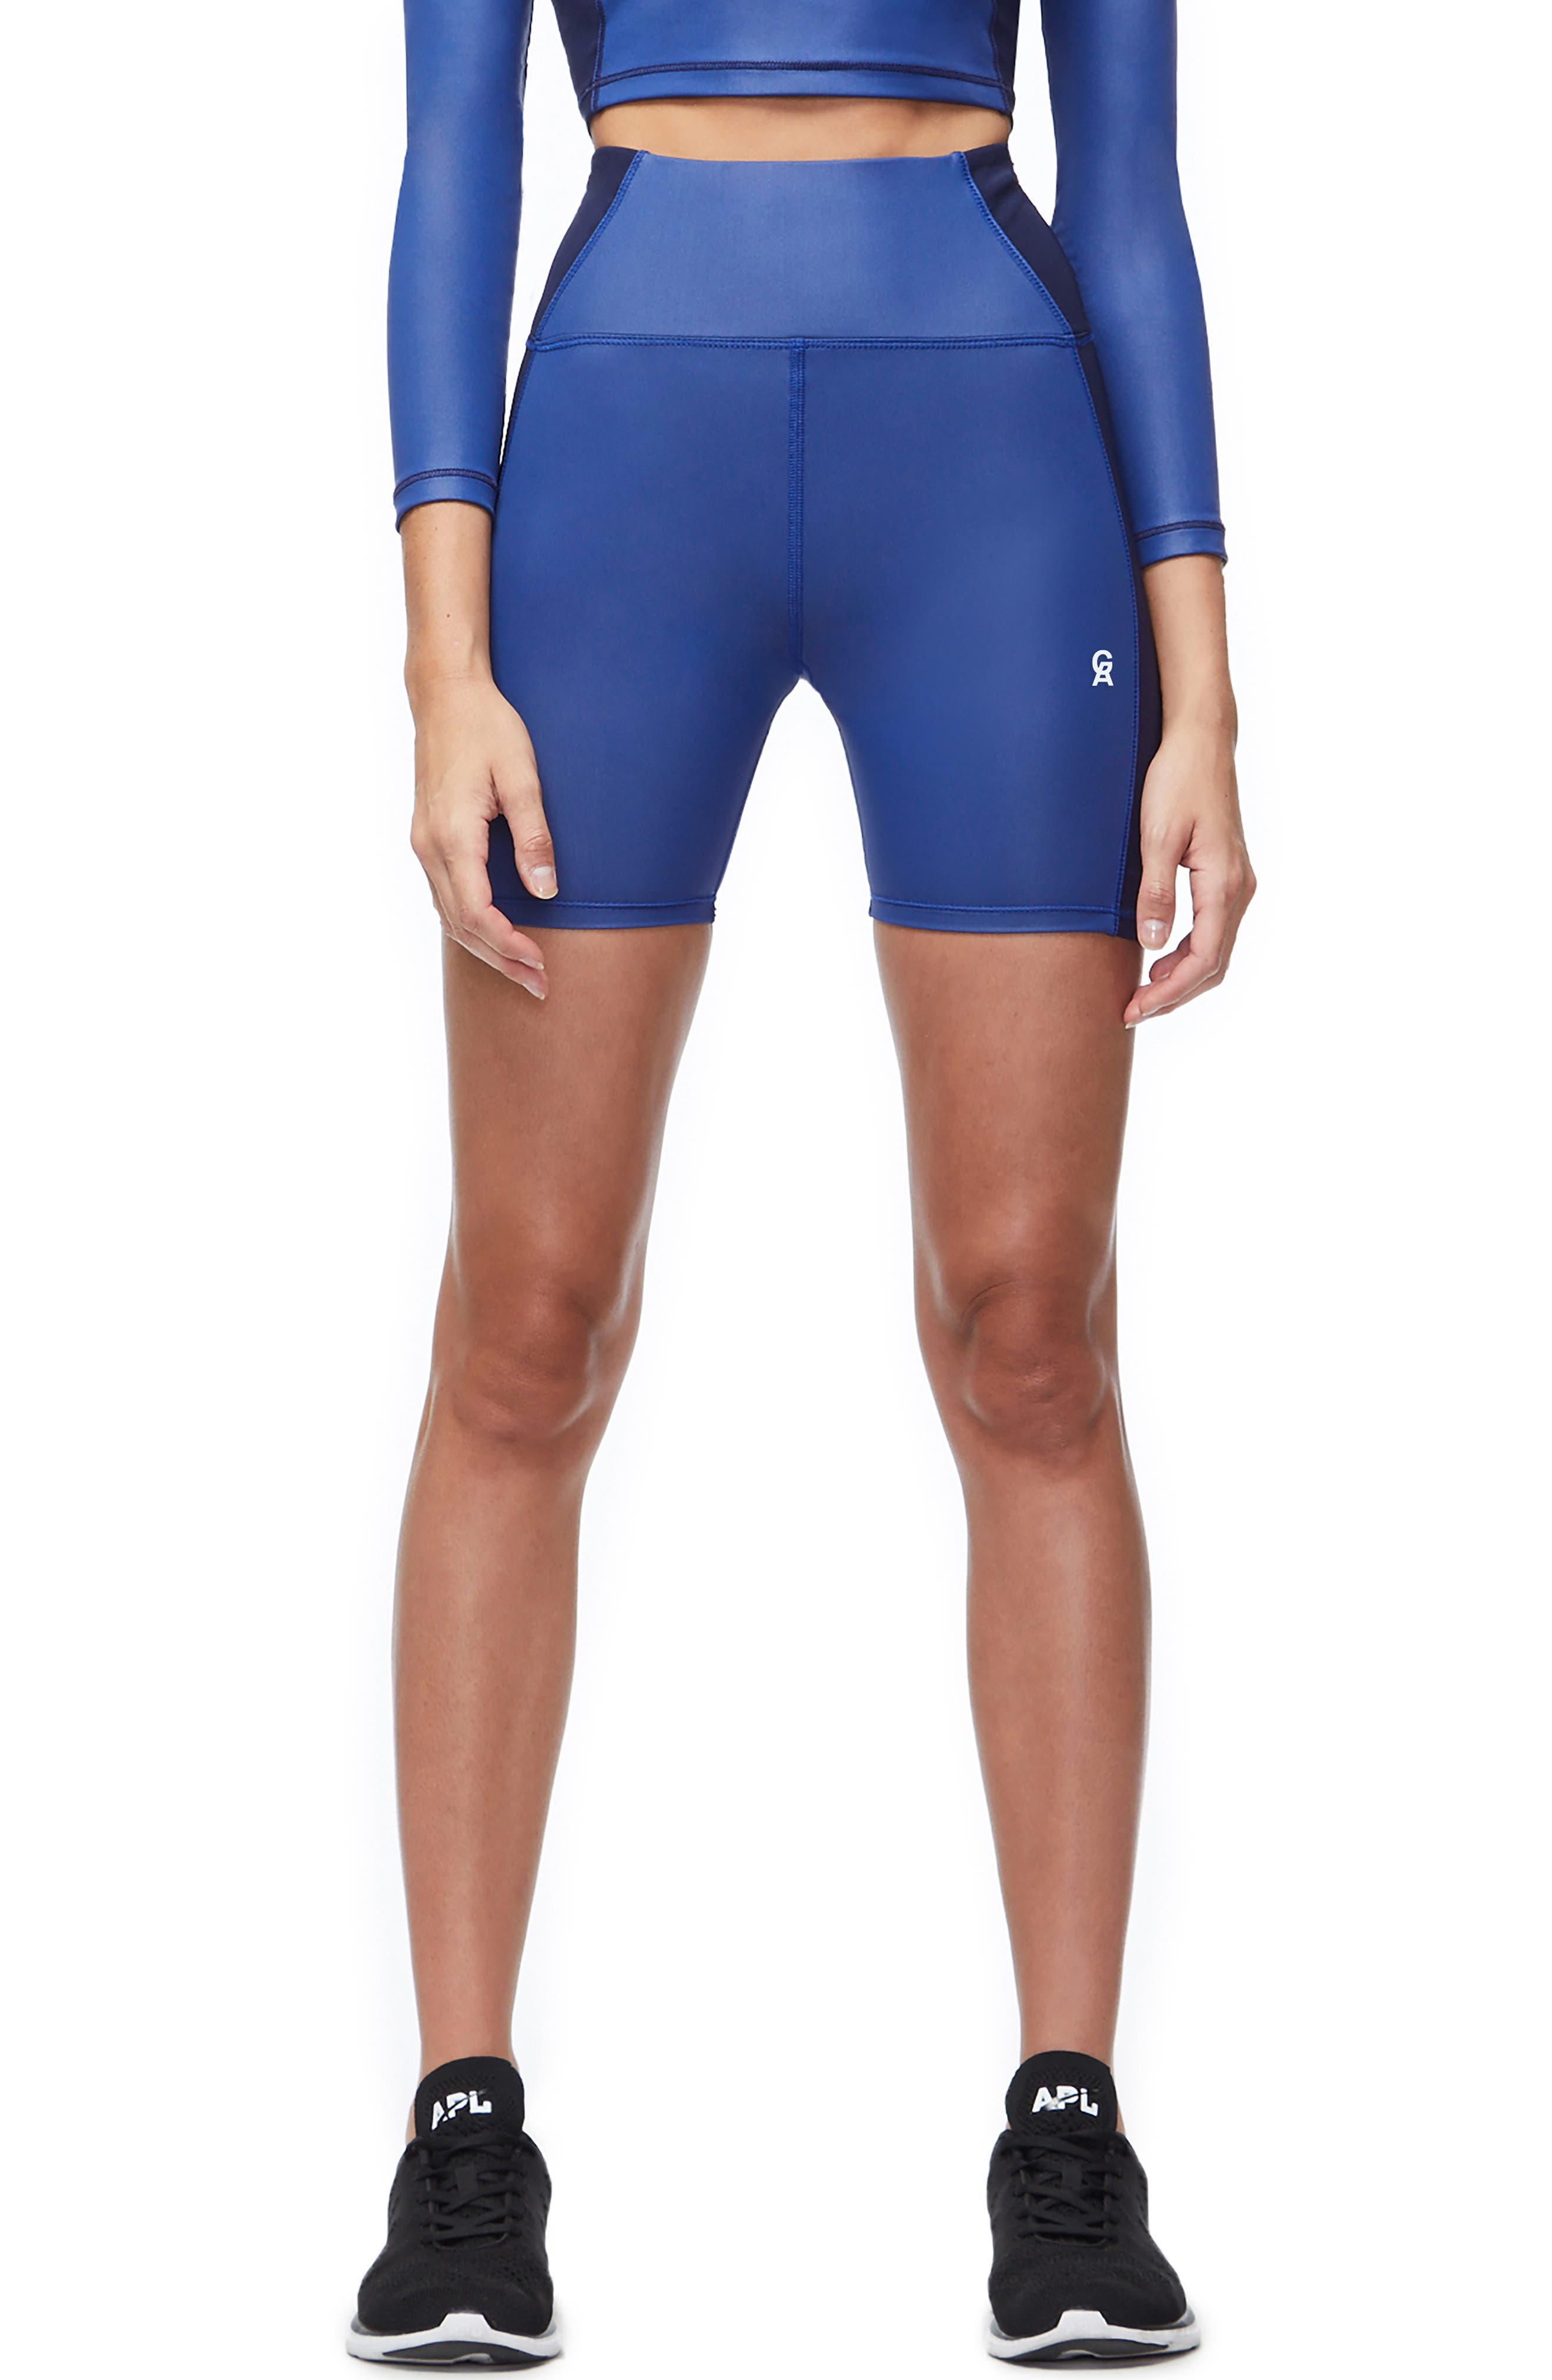 High Waist Biker Shorts,                             Main thumbnail 1, color,                             BLUE001